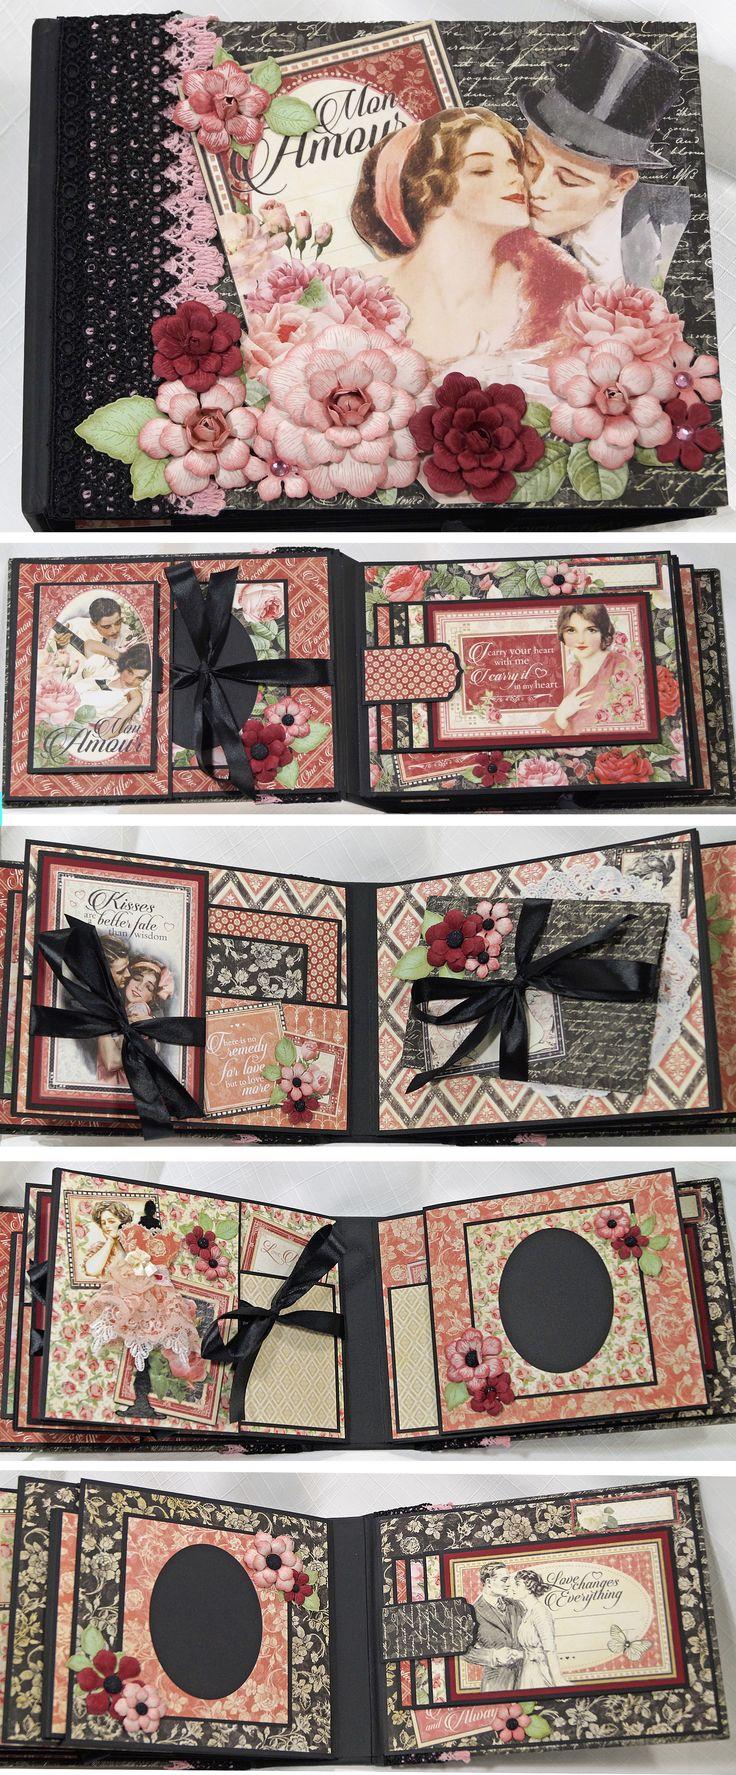 Graphic 45 Mon Amour scrapbook Mini Album http://www.ebay.com/itm/262089391021?ssPageName=STRK:MESELX:IT&_trksid=p3984.m1555.l2649